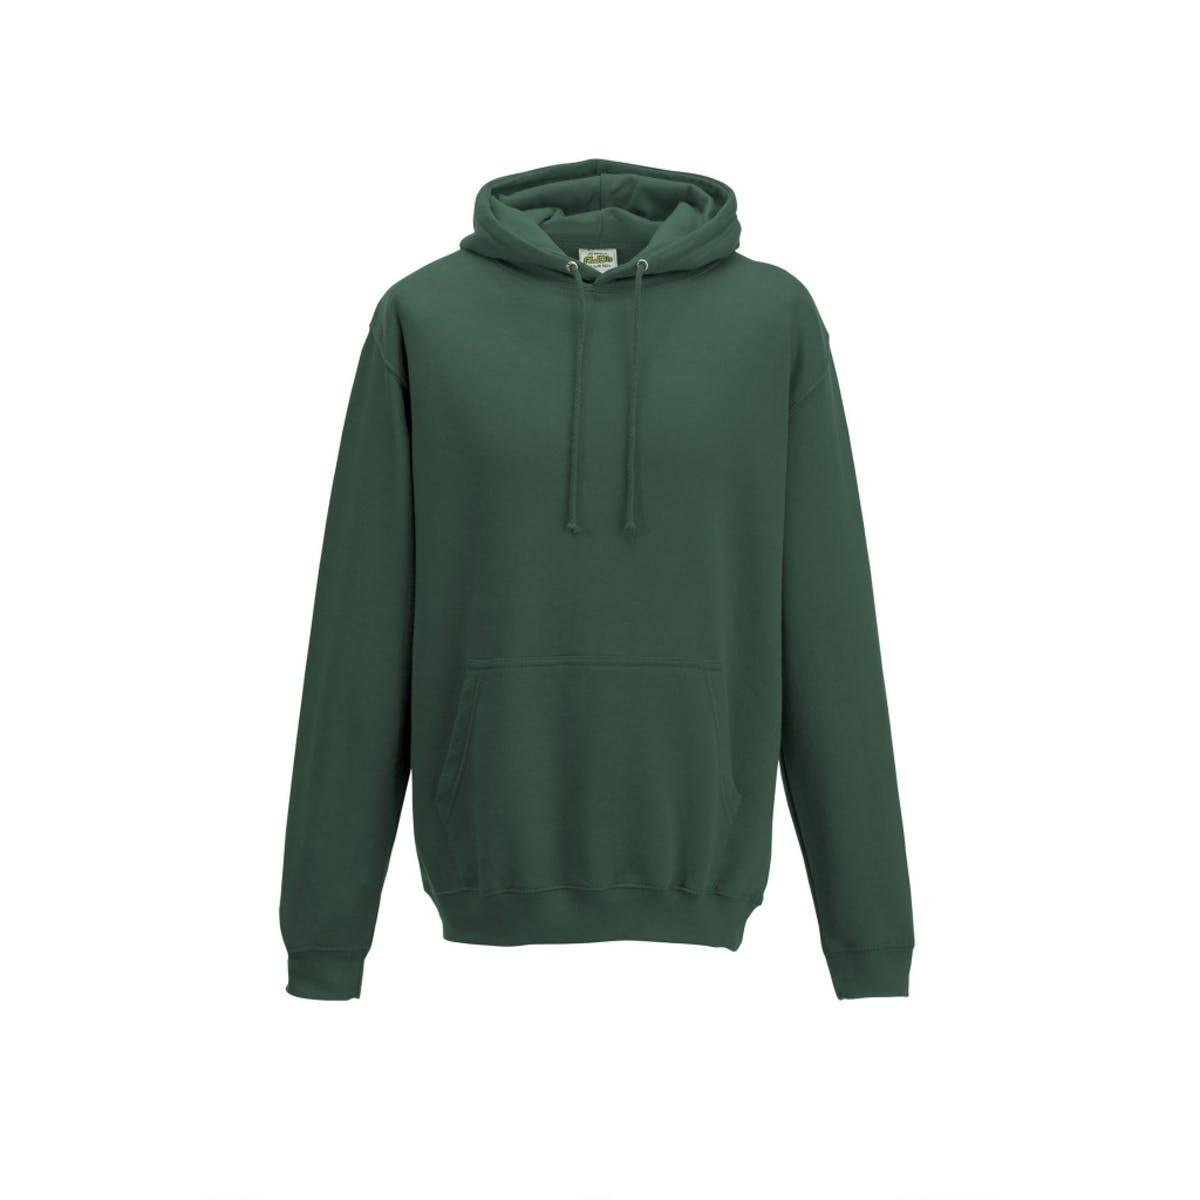 moss green college hoodies